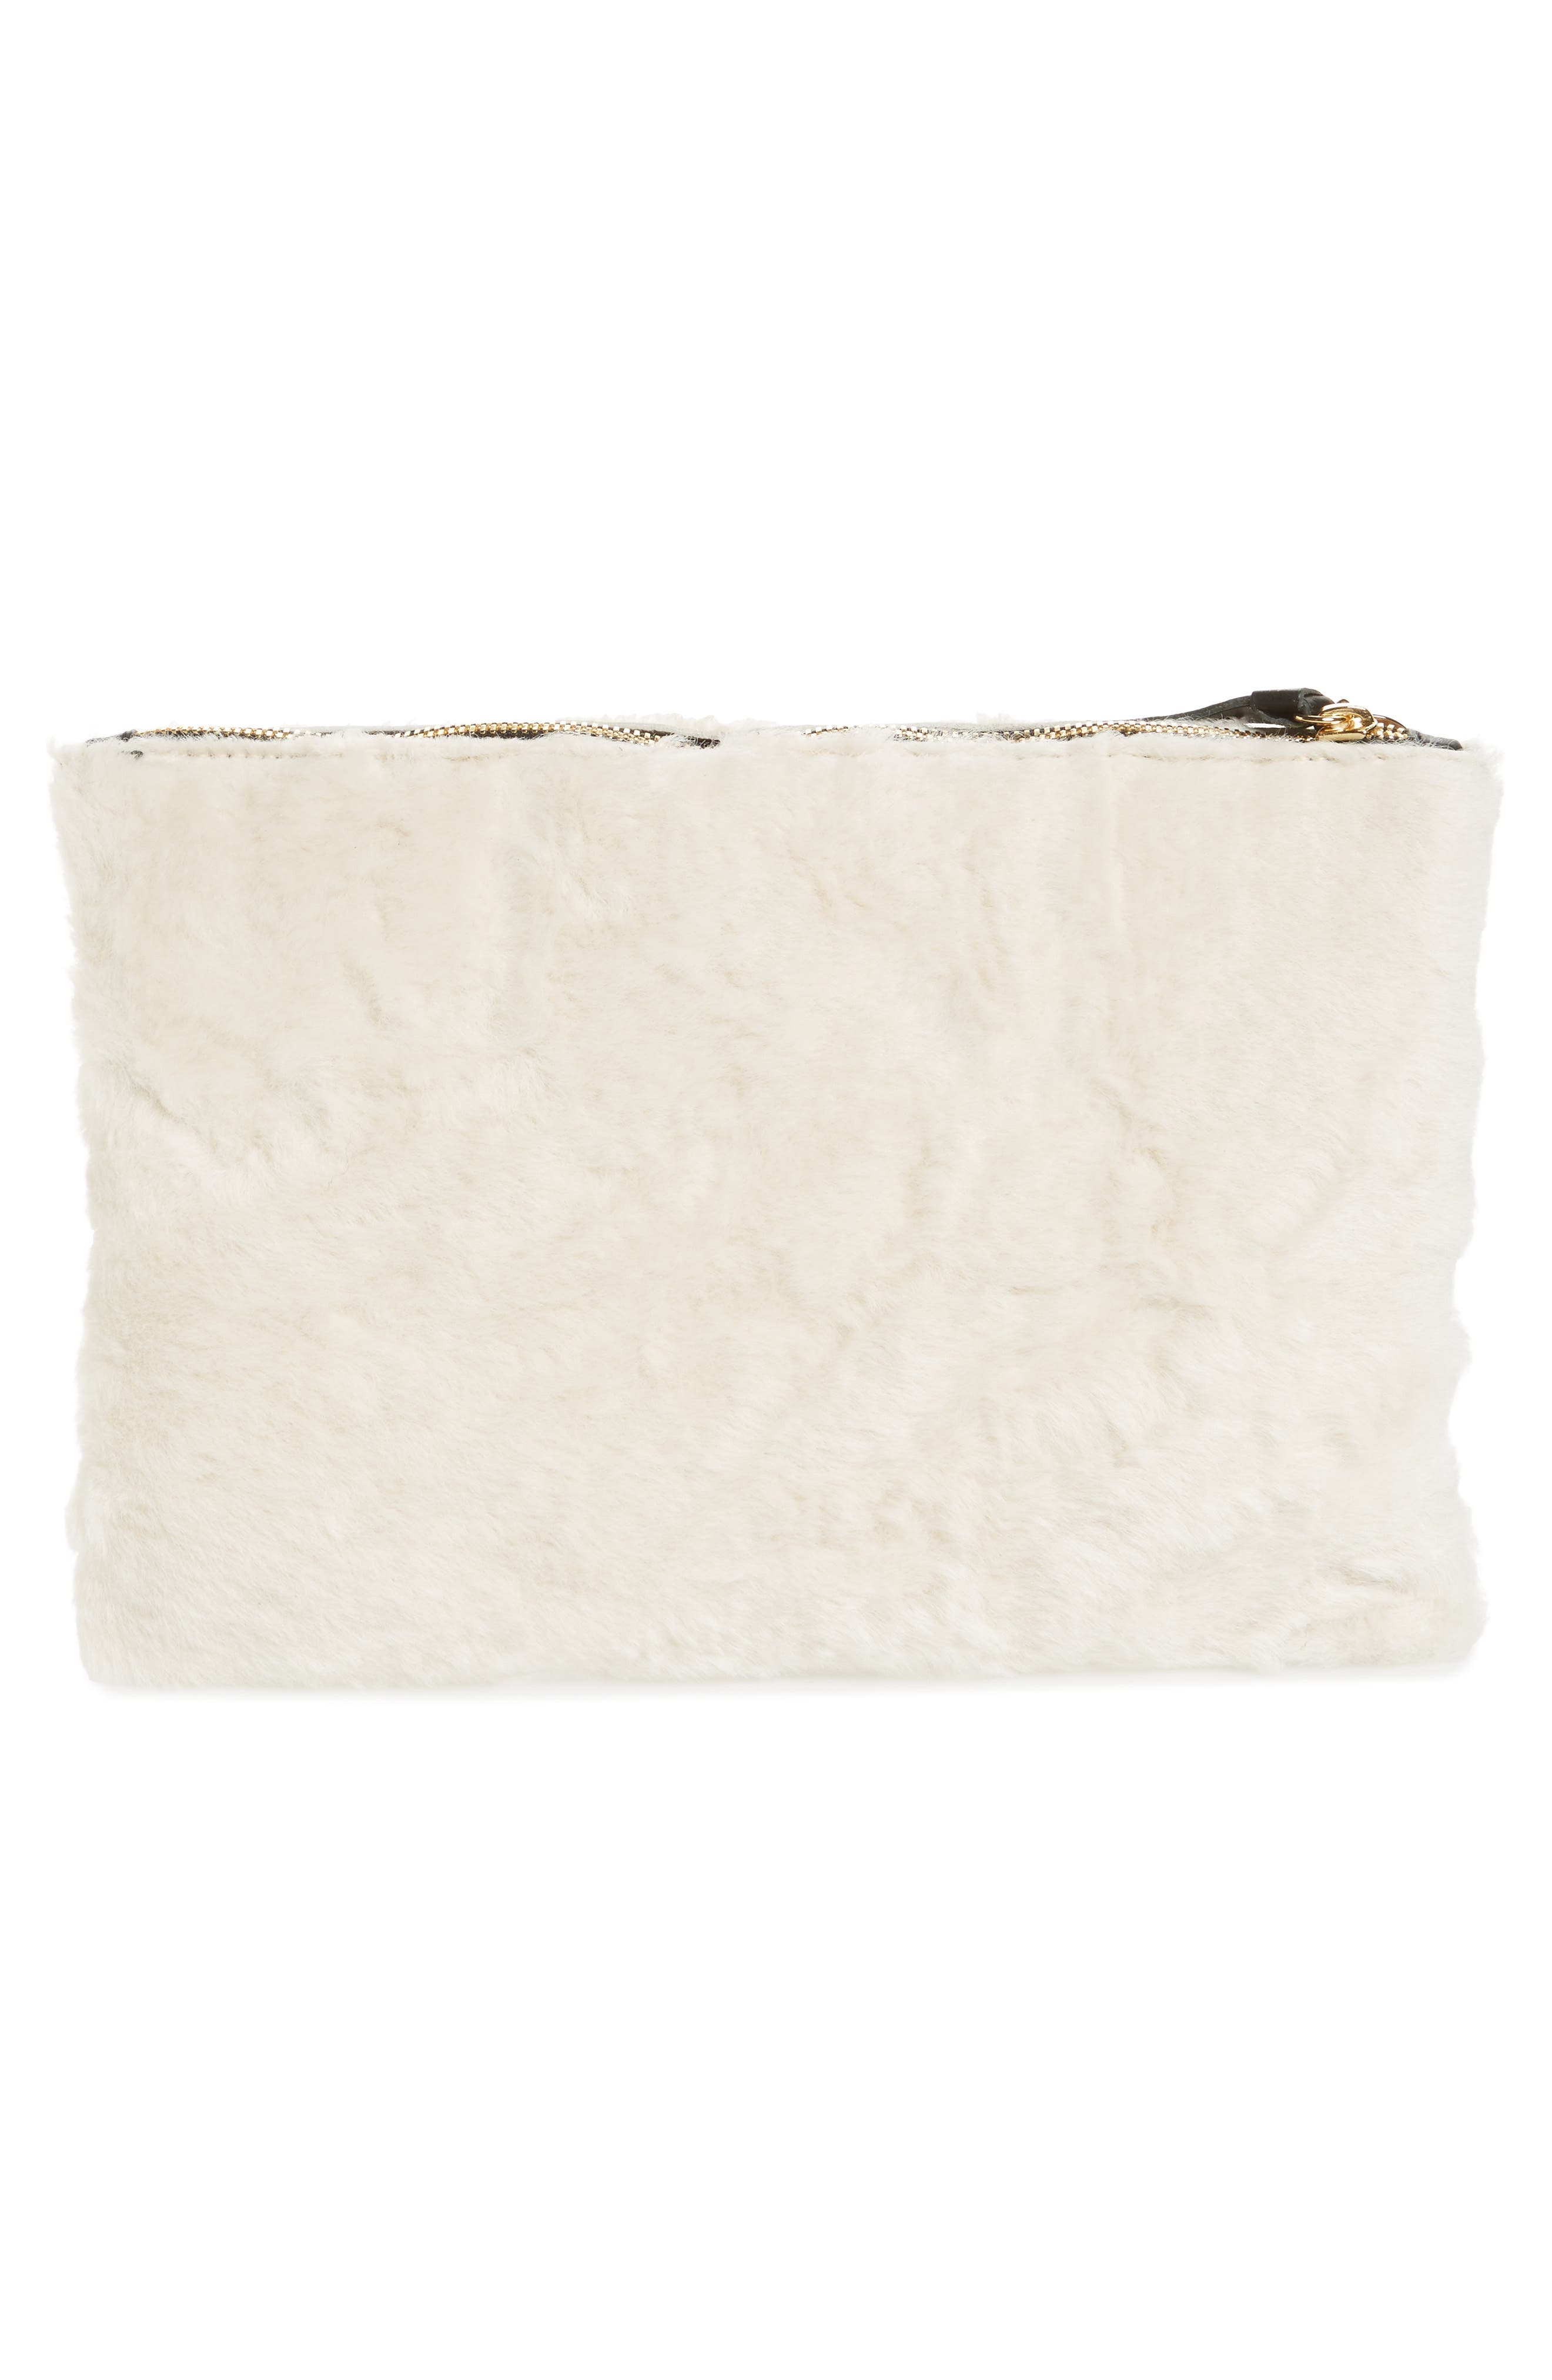 Genuine Shearling Flat Clutch,                             Alternate thumbnail 4, color,                             Cream Shearling